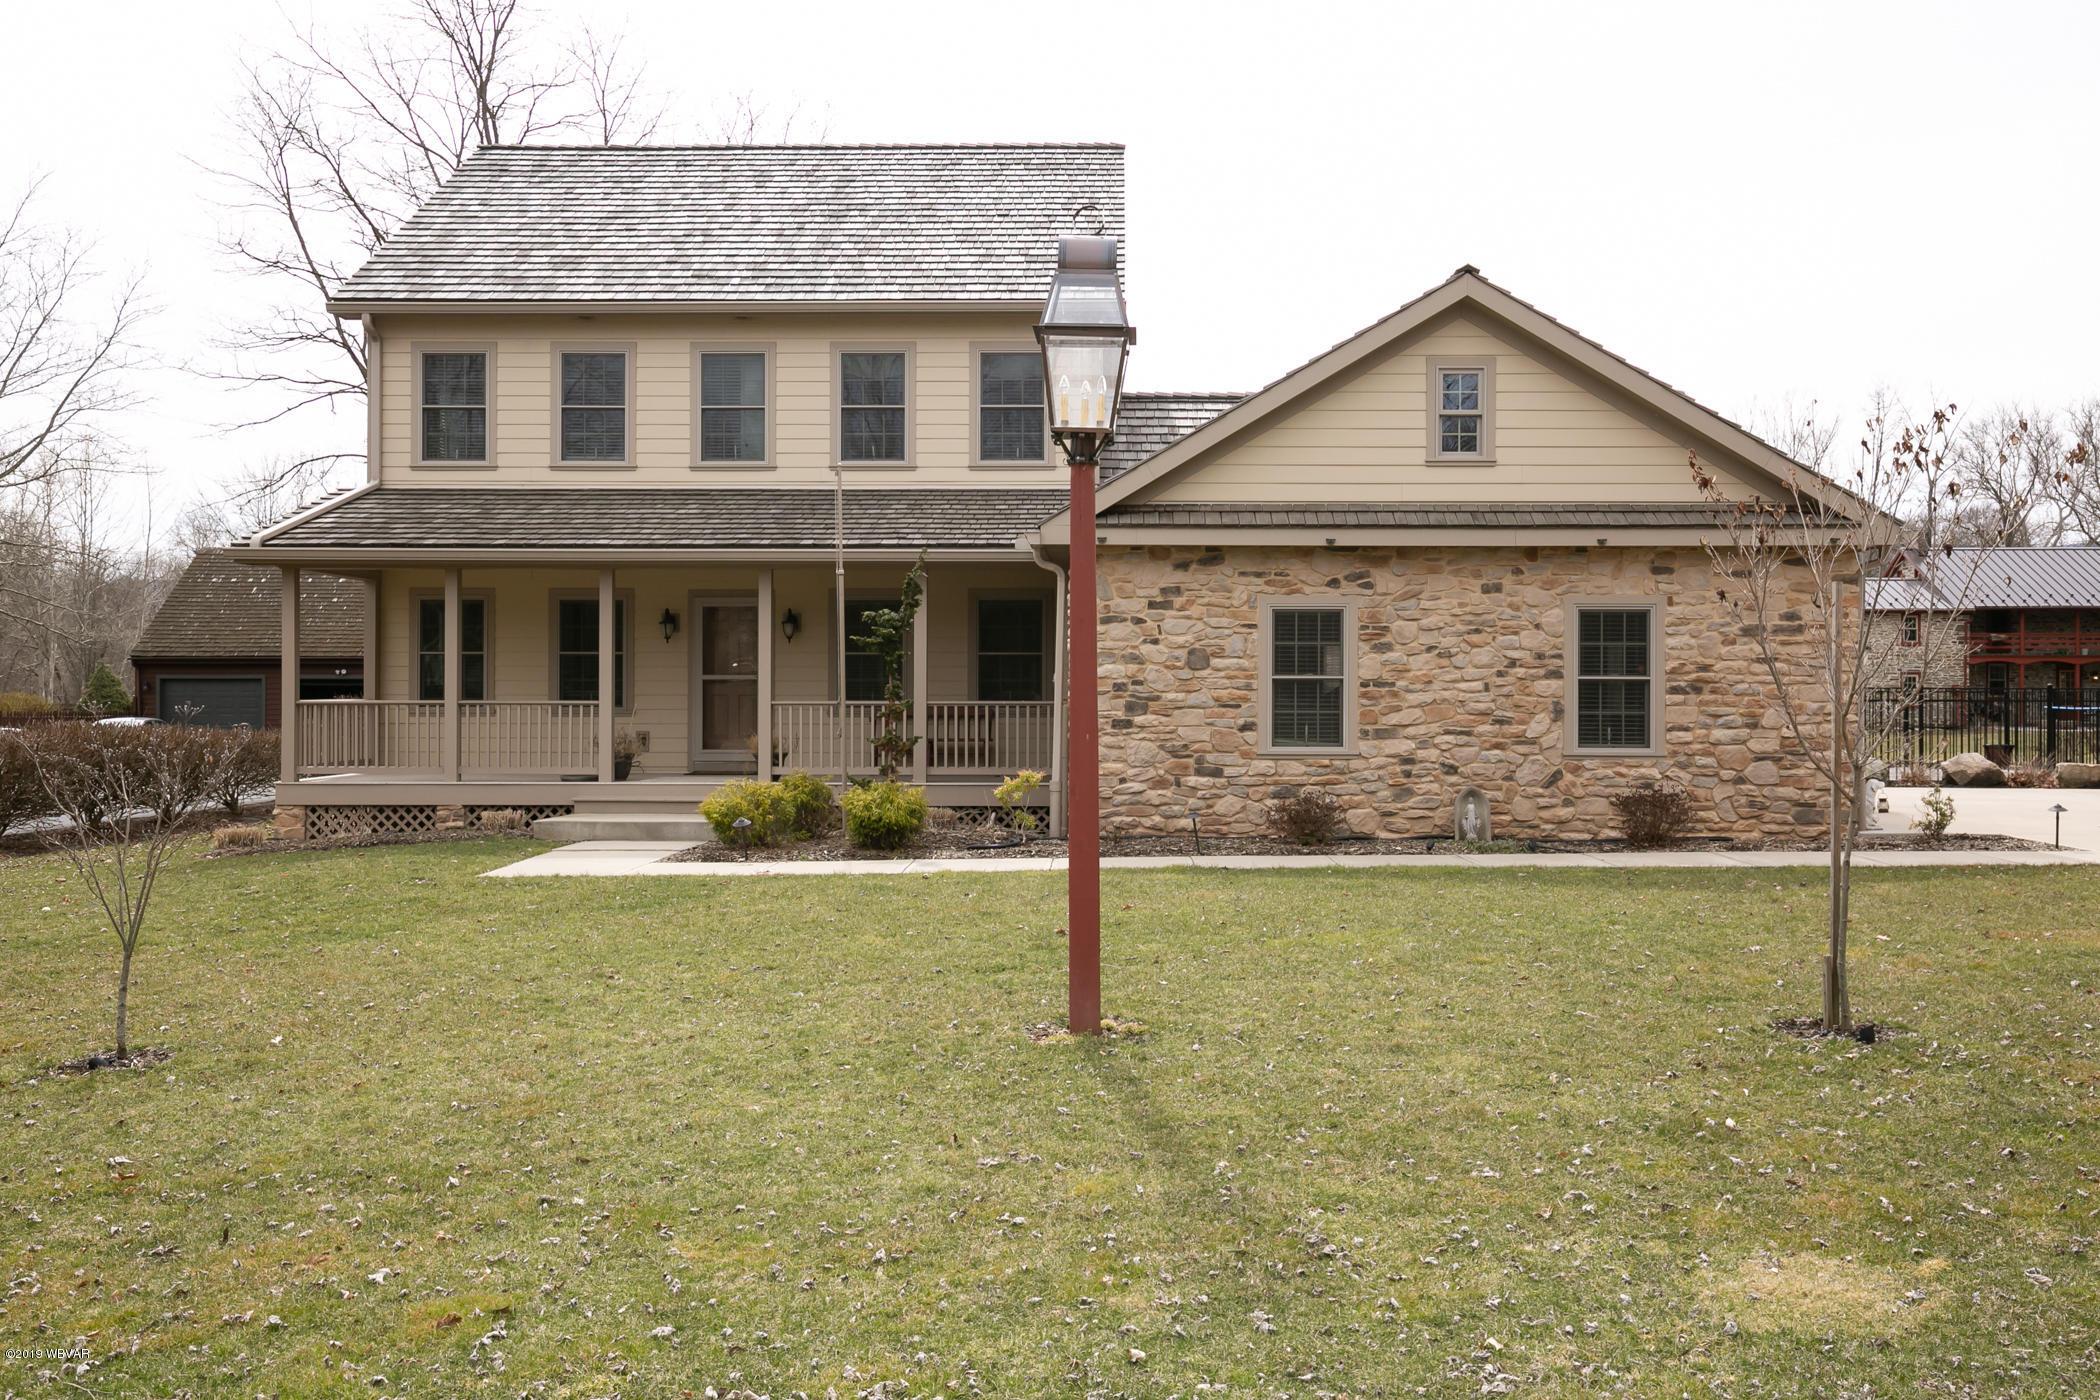 1720 MILLWOOD LANE,Montoursville,PA 17754,3 Bedrooms Bedrooms,3.5 BathroomsBathrooms,Residential,MILLWOOD,WB-88841